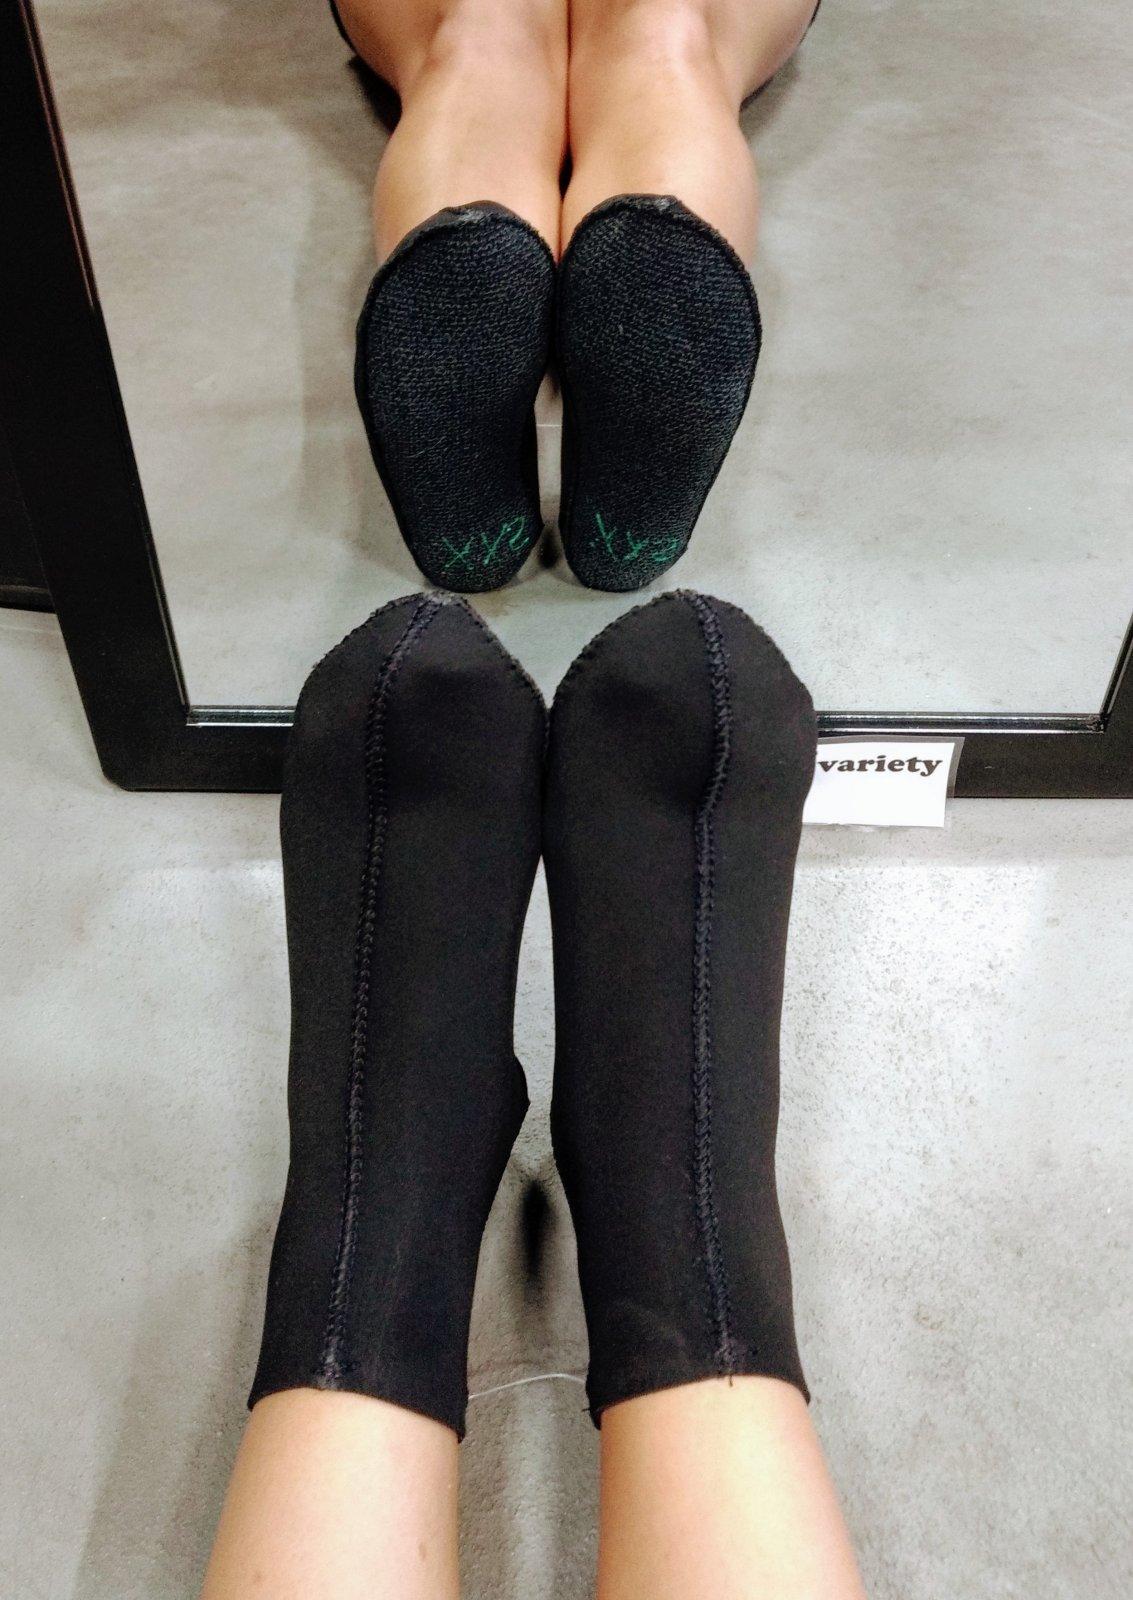 5a18e7b3aae7 Freediving Socks